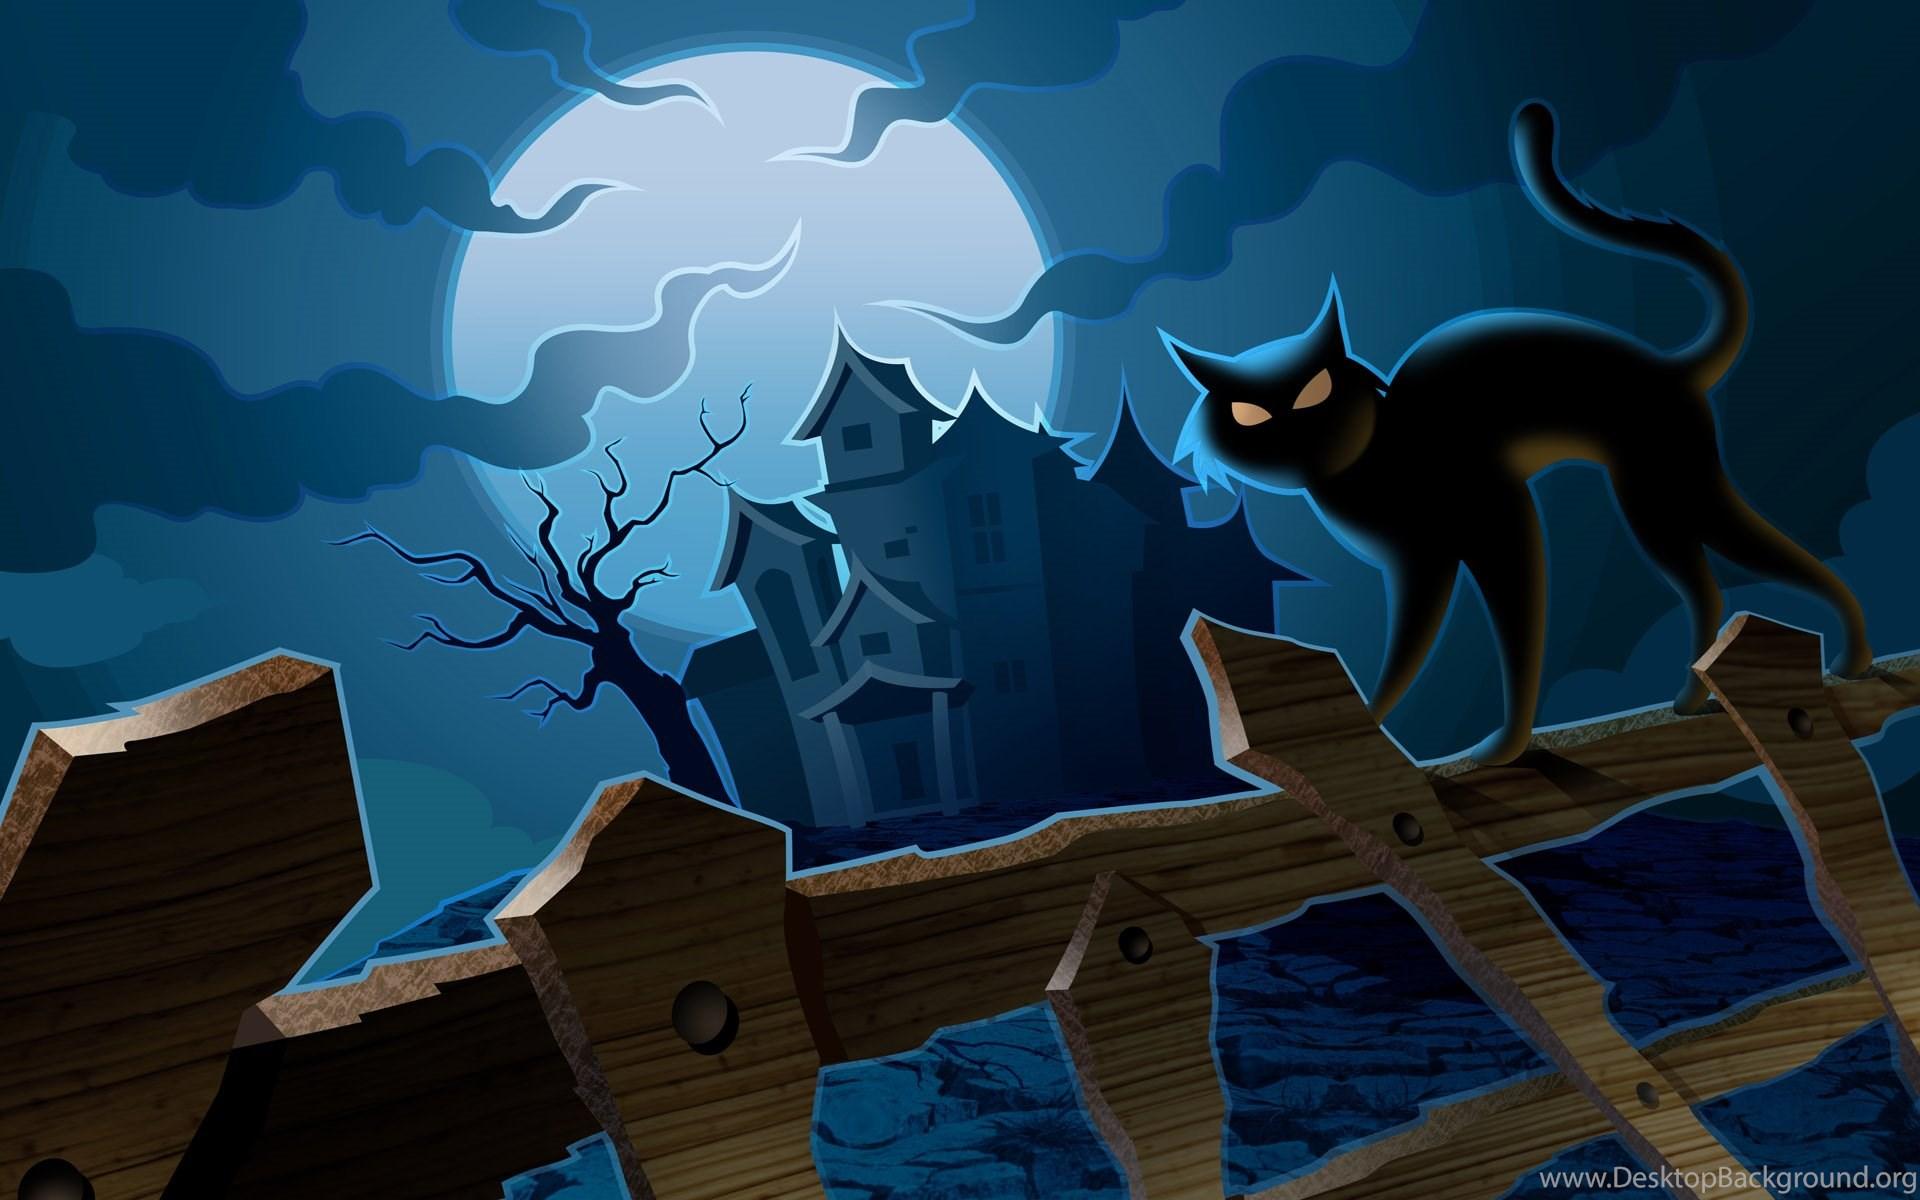 Fantastic Wallpaper Halloween High Resolution - 868650_scary-halloween-high-definition-full-screen-wallpaper-free_1920x1200_h  Snapshot_749878.jpg